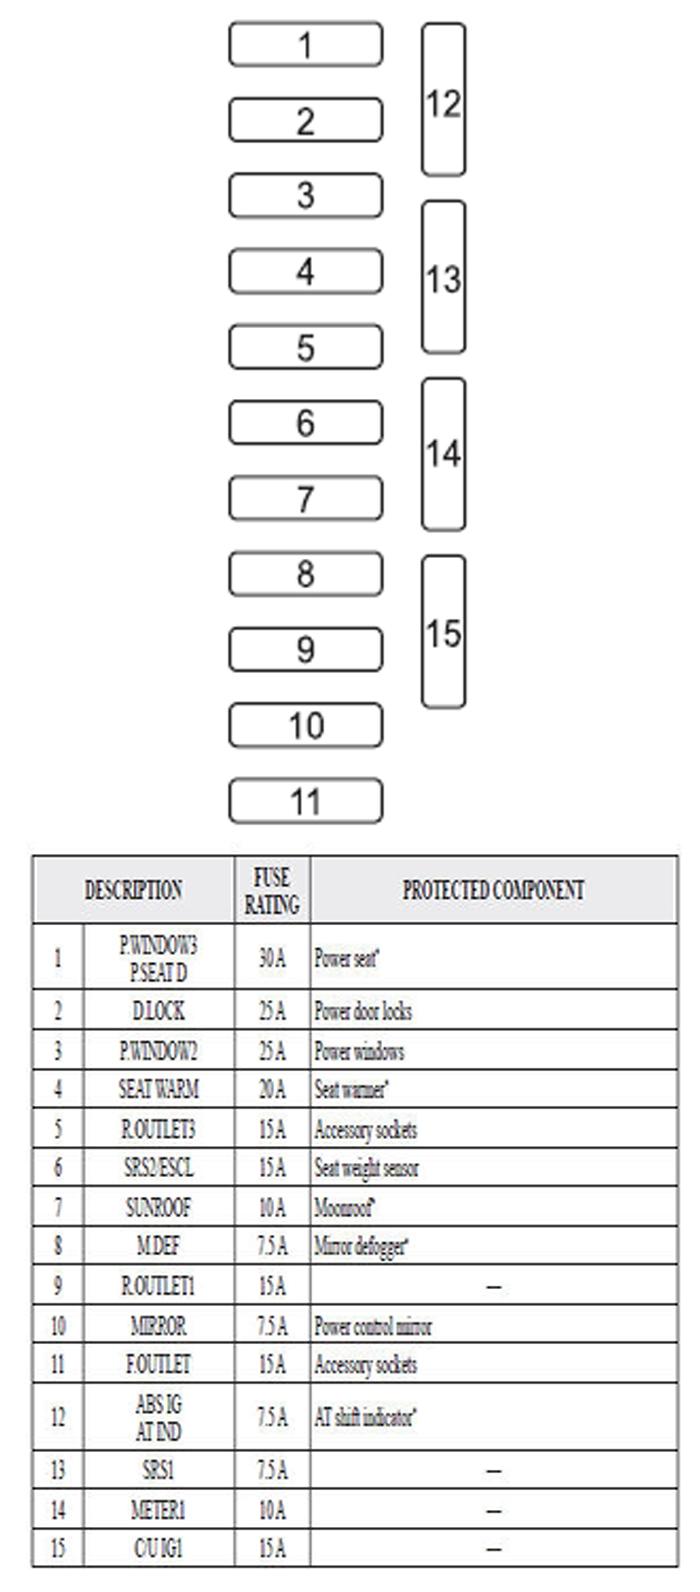 medium resolution of car owners manual fuse box wiring diagram technic car owners manual fuse box